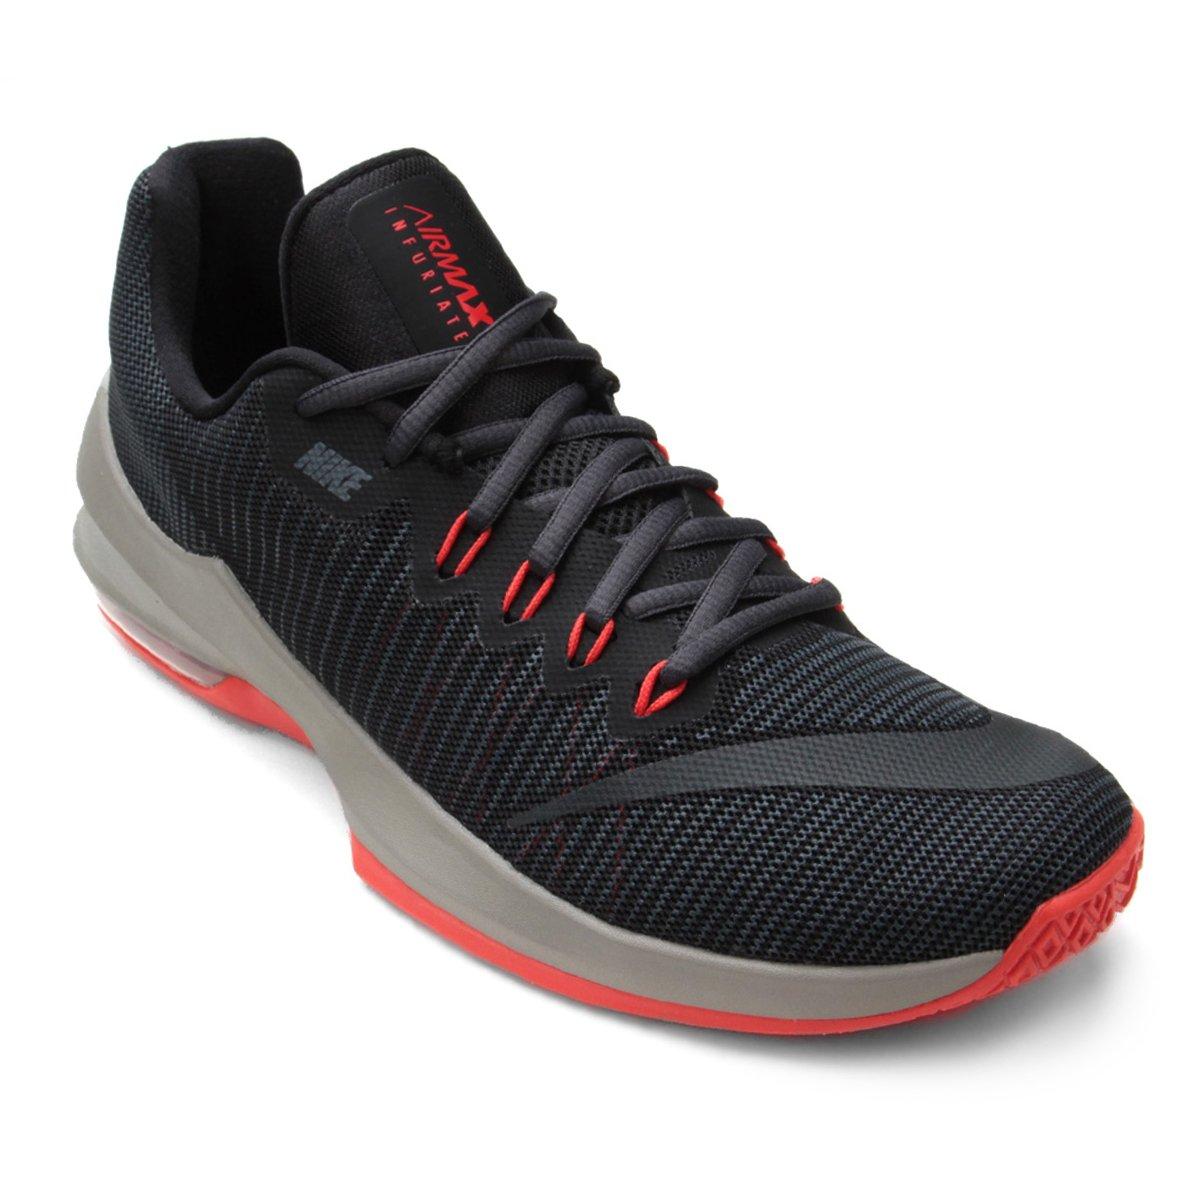 new styles bdabe c3e70 Tênis Nike Air Max Infuriate 2 Low Masculino - Preto e Vermelho - Compre  Agora  Loja NBA